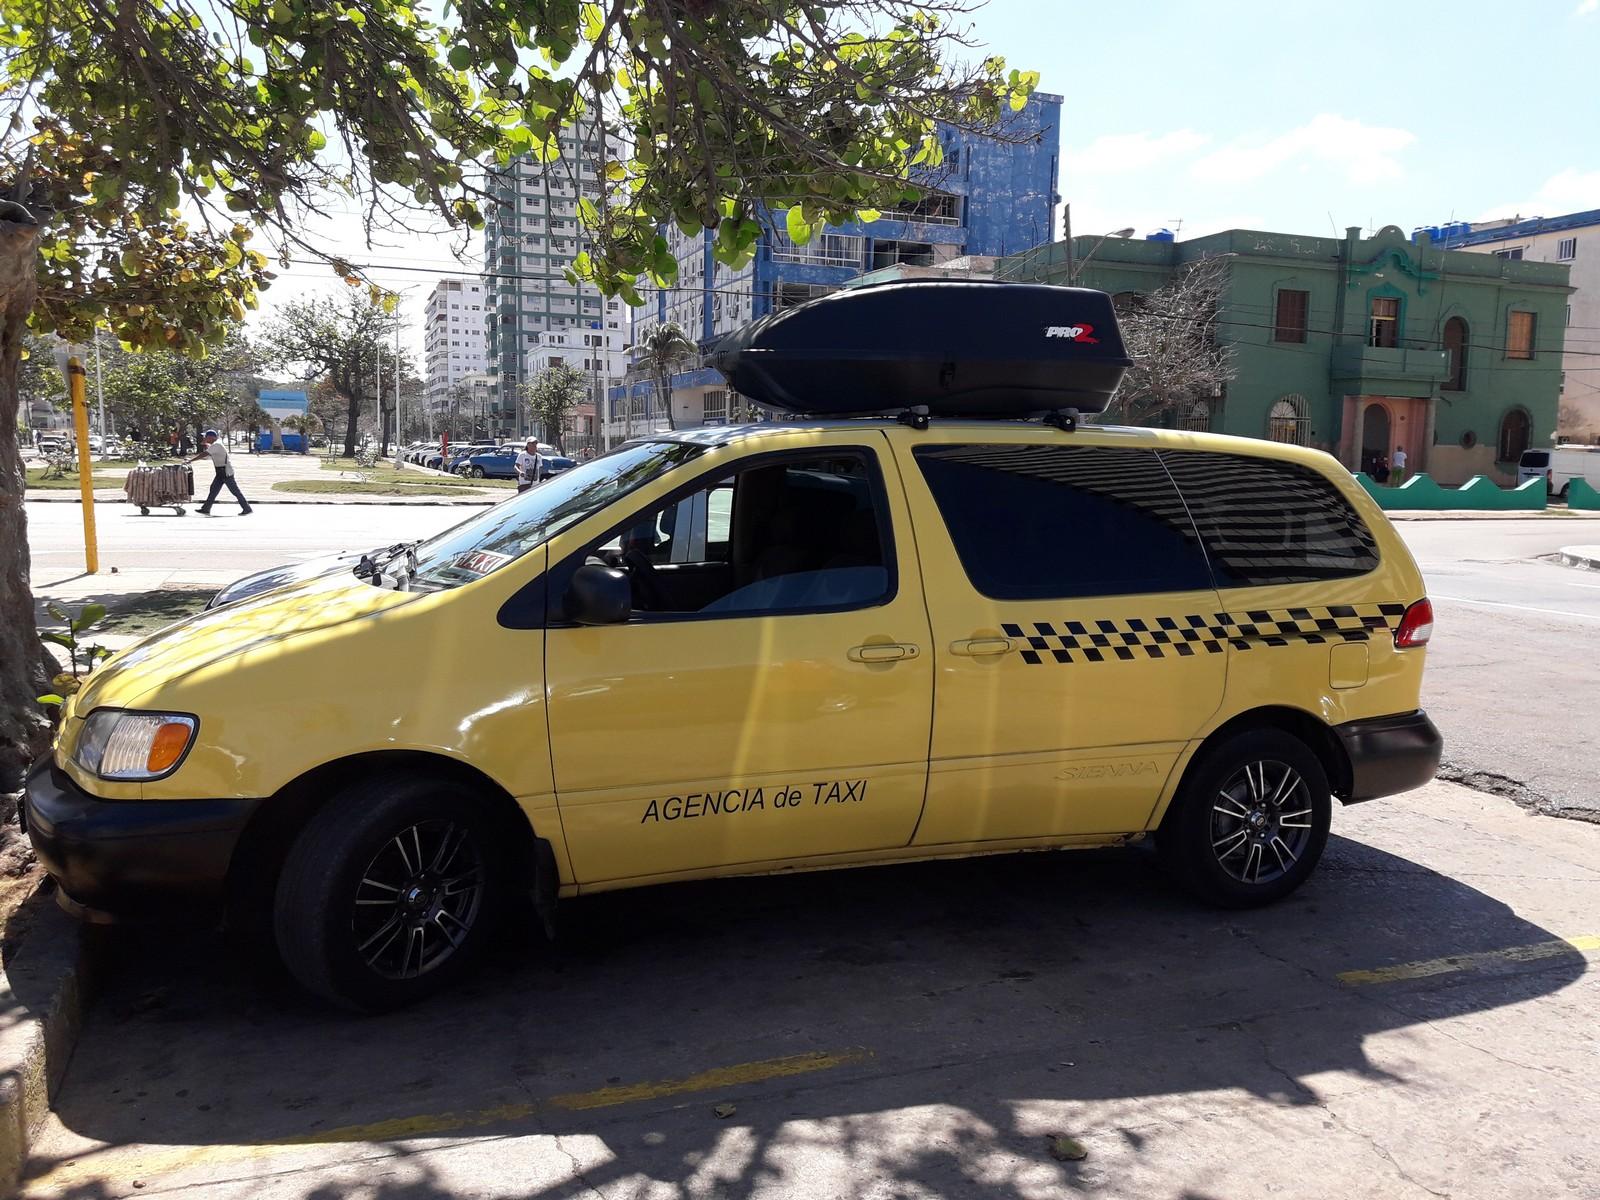 Collective Taxi Transfer